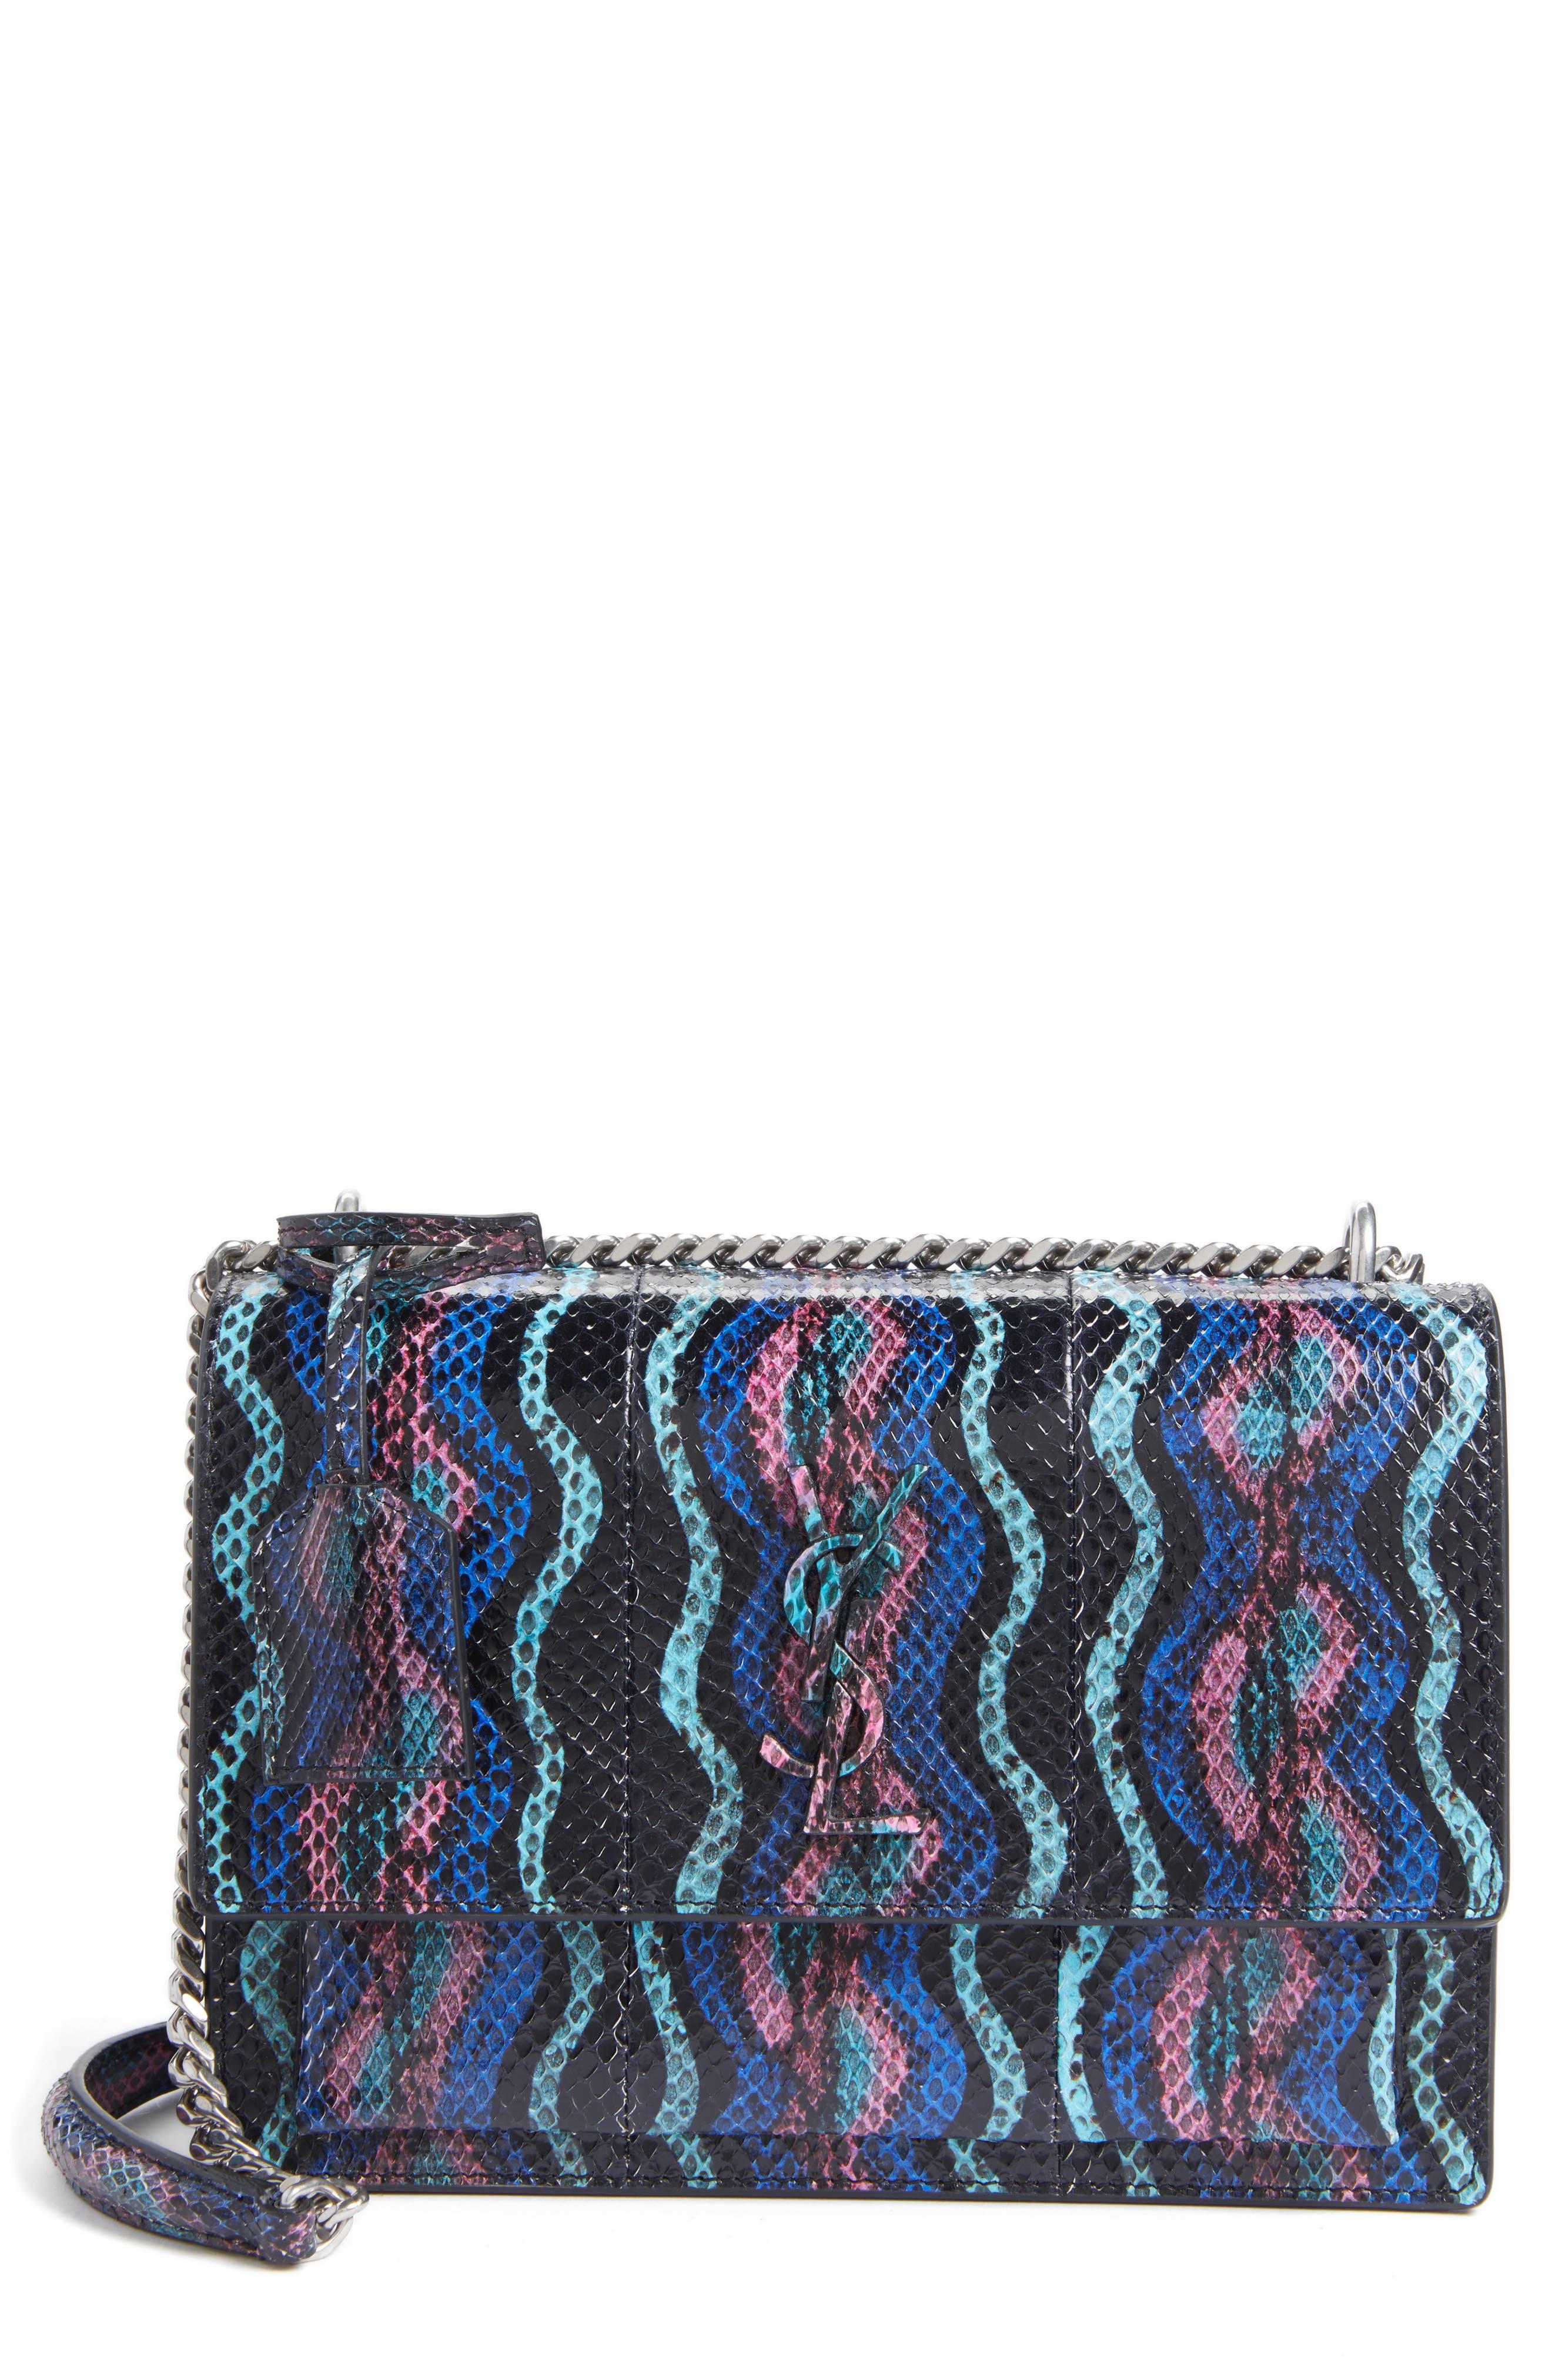 Medium Monogram Sunset Genuine Snakeskin Crossbody Bag,                         Main,                         color, 124